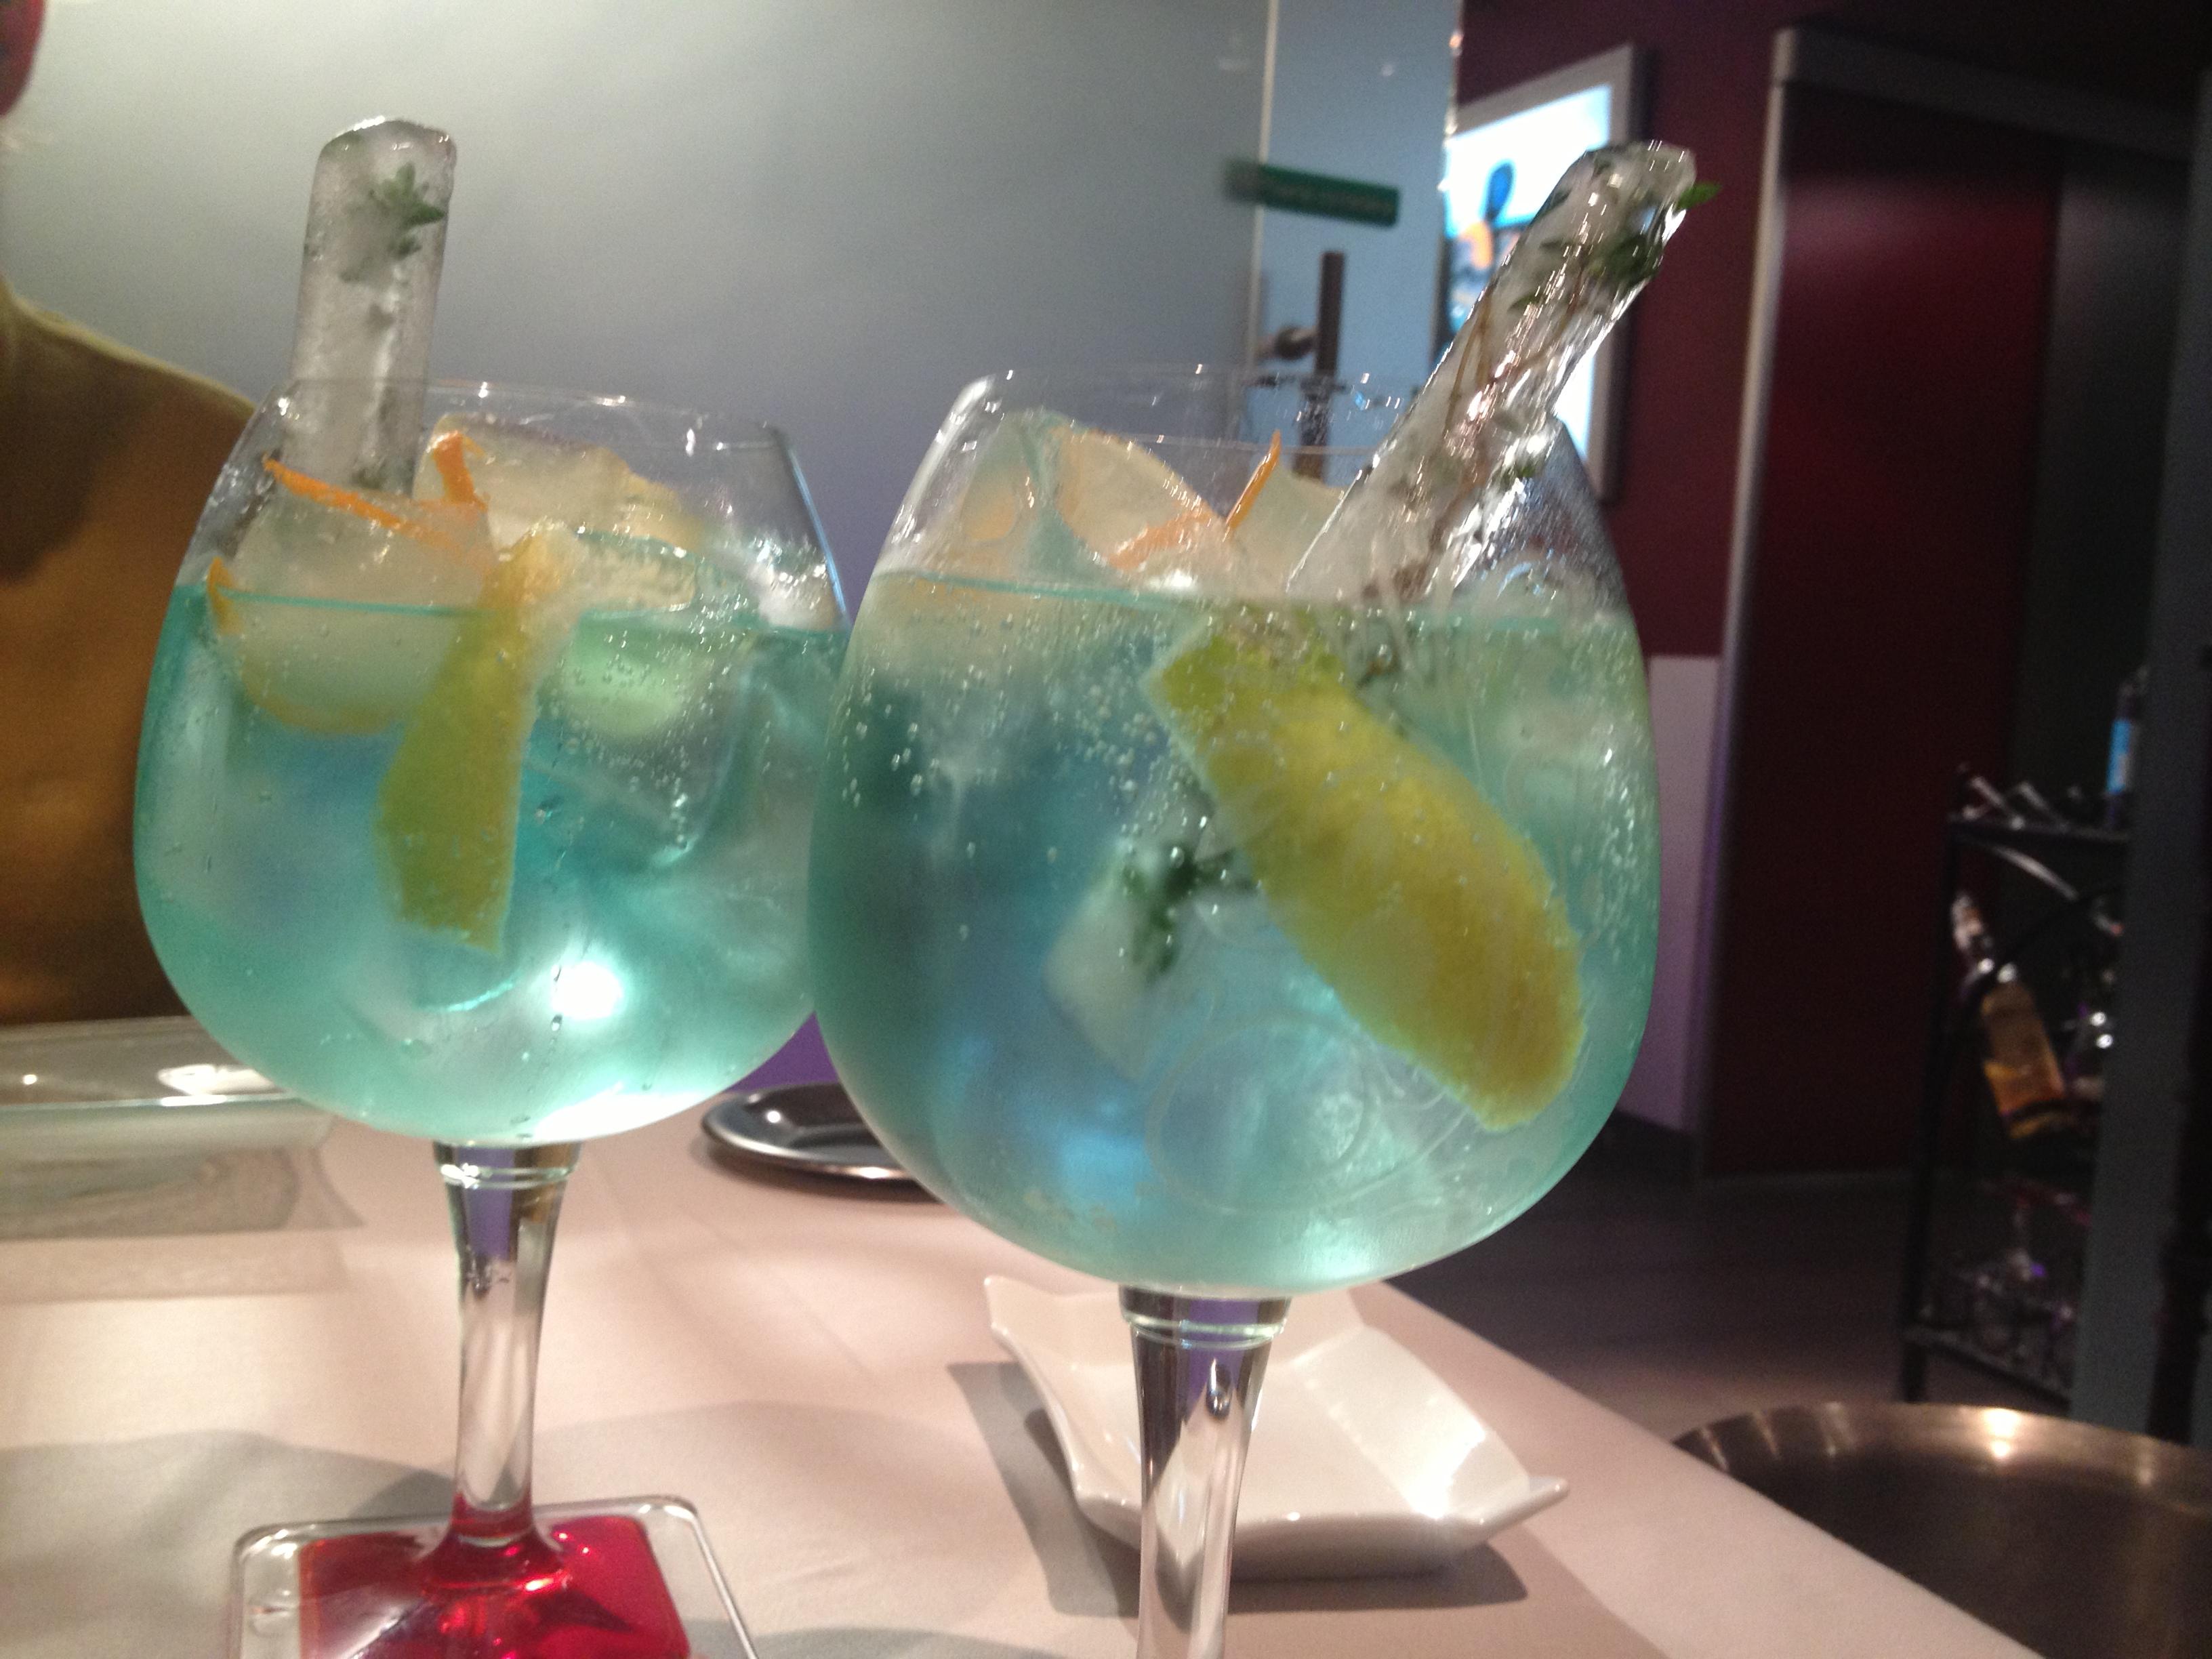 Un ejemplo de los Gin Tónics espectaculares de Eduardo Pérez